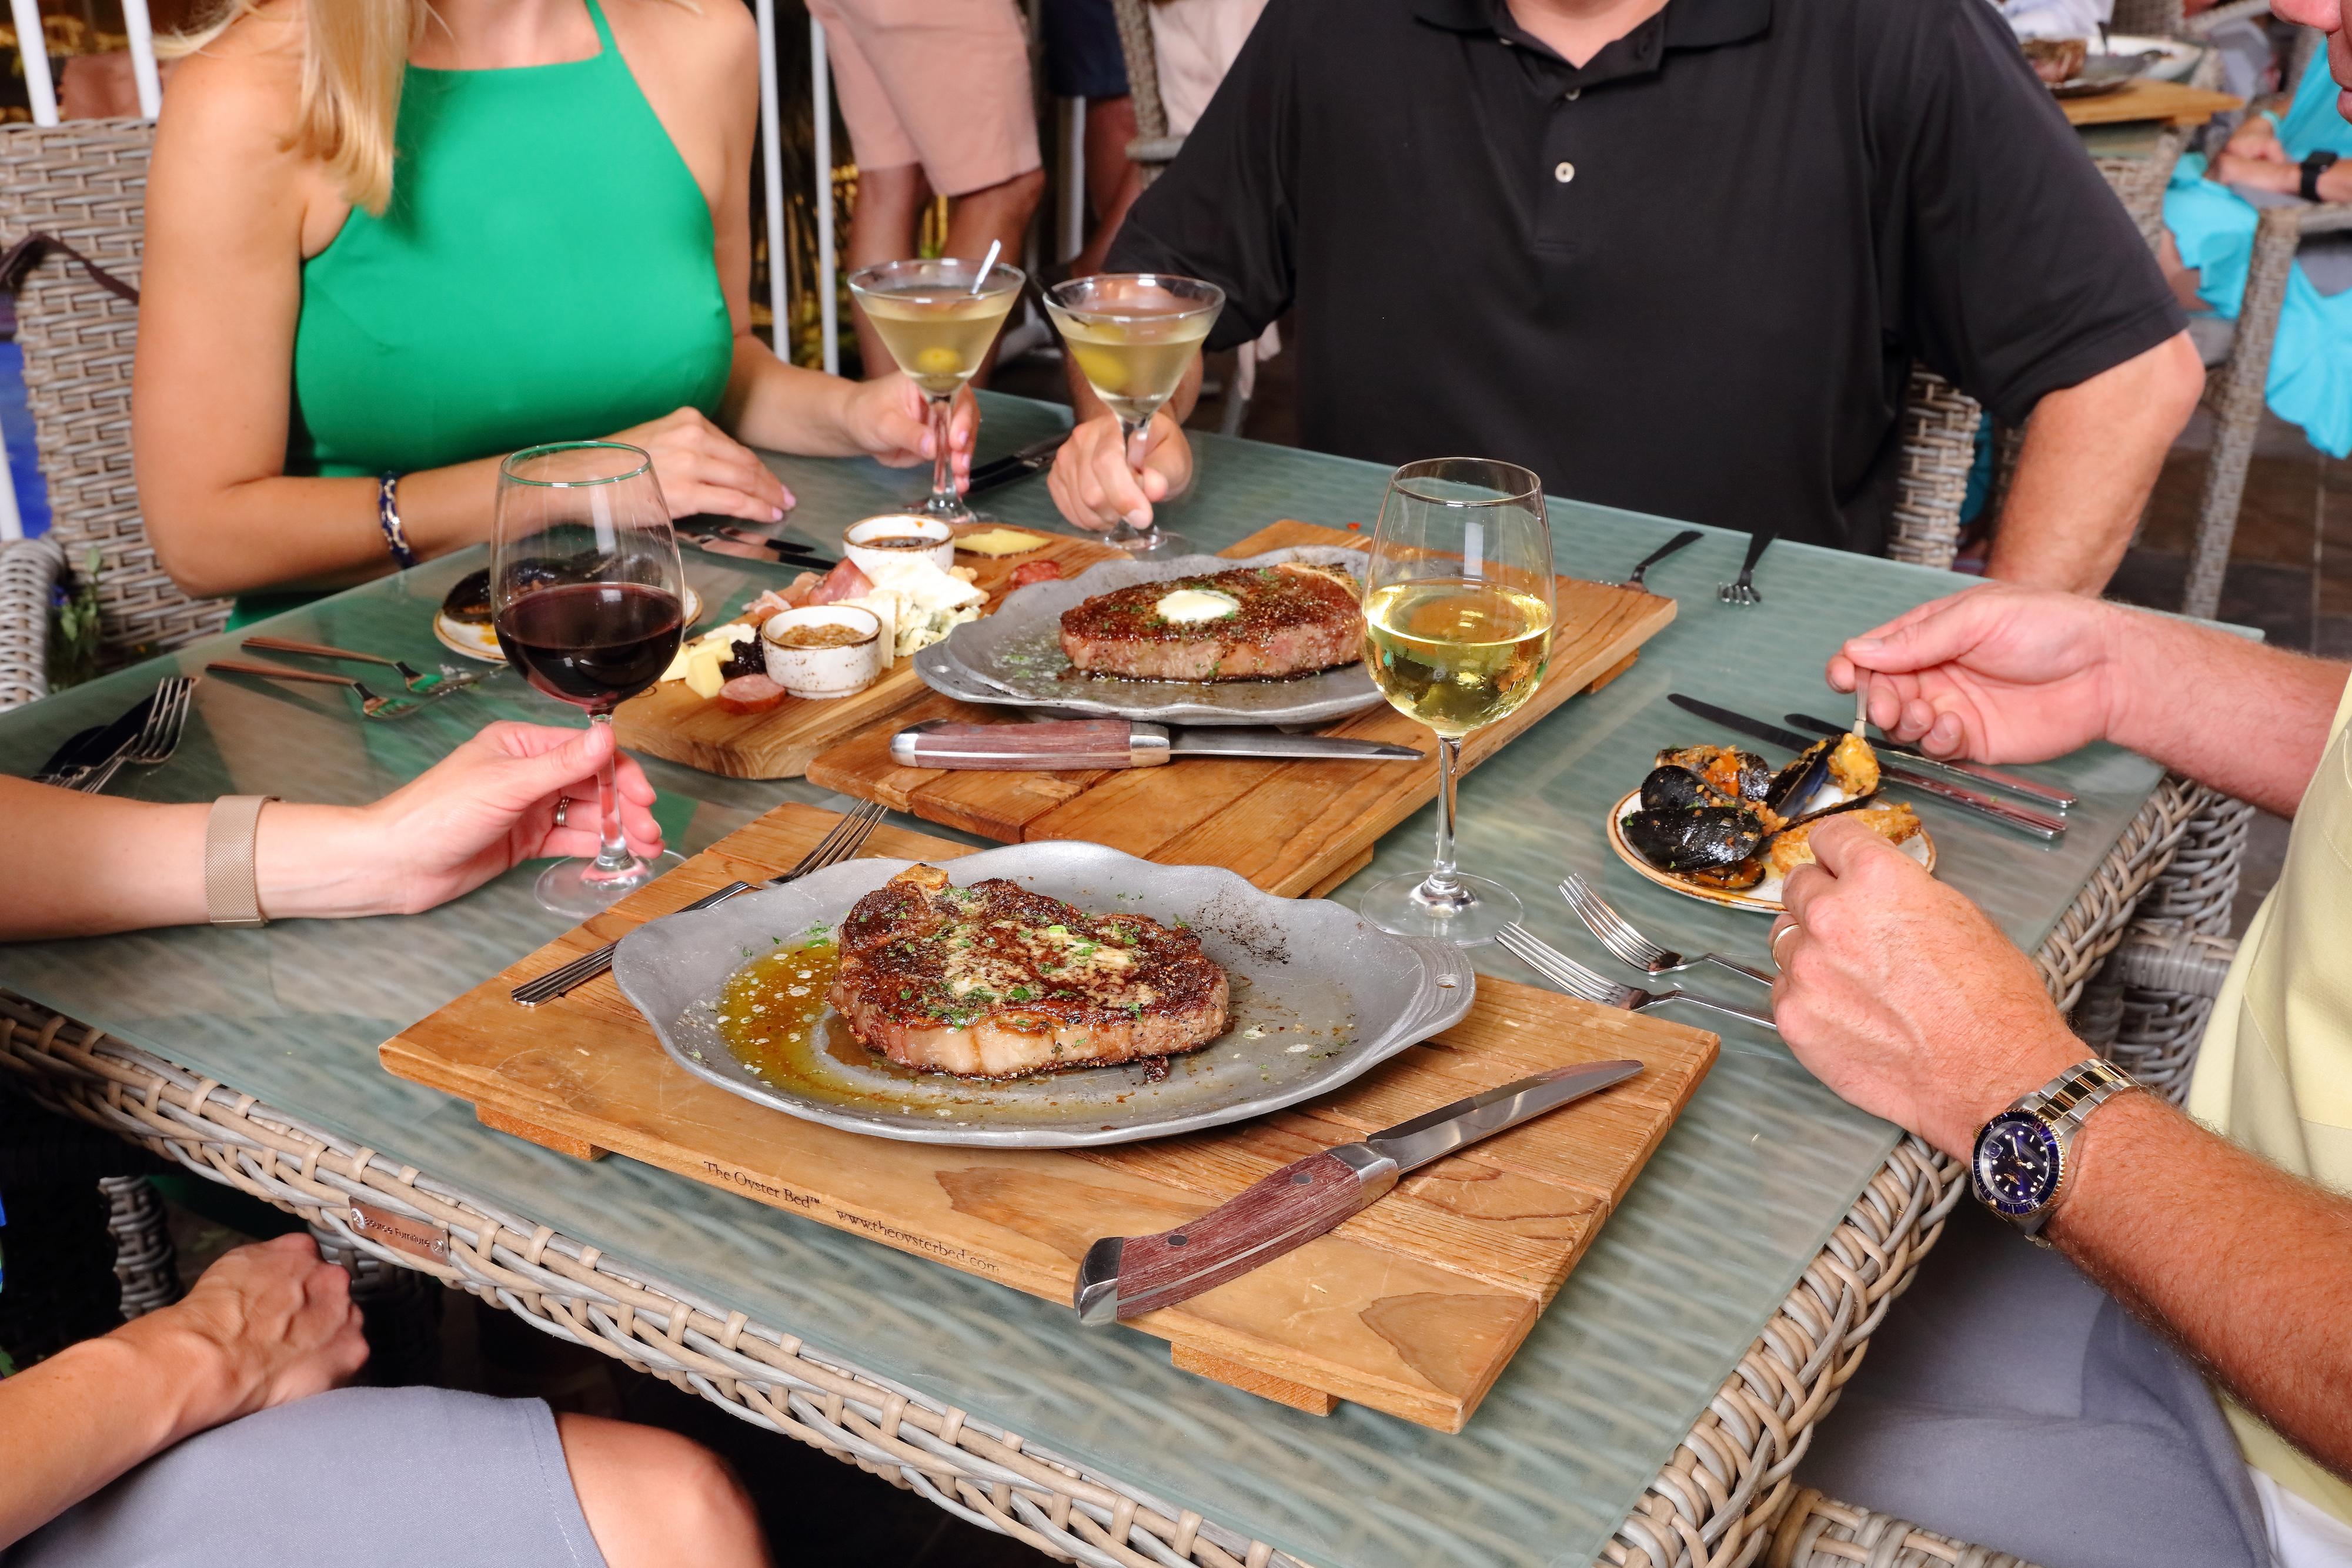 Diners Enjoying Dinner